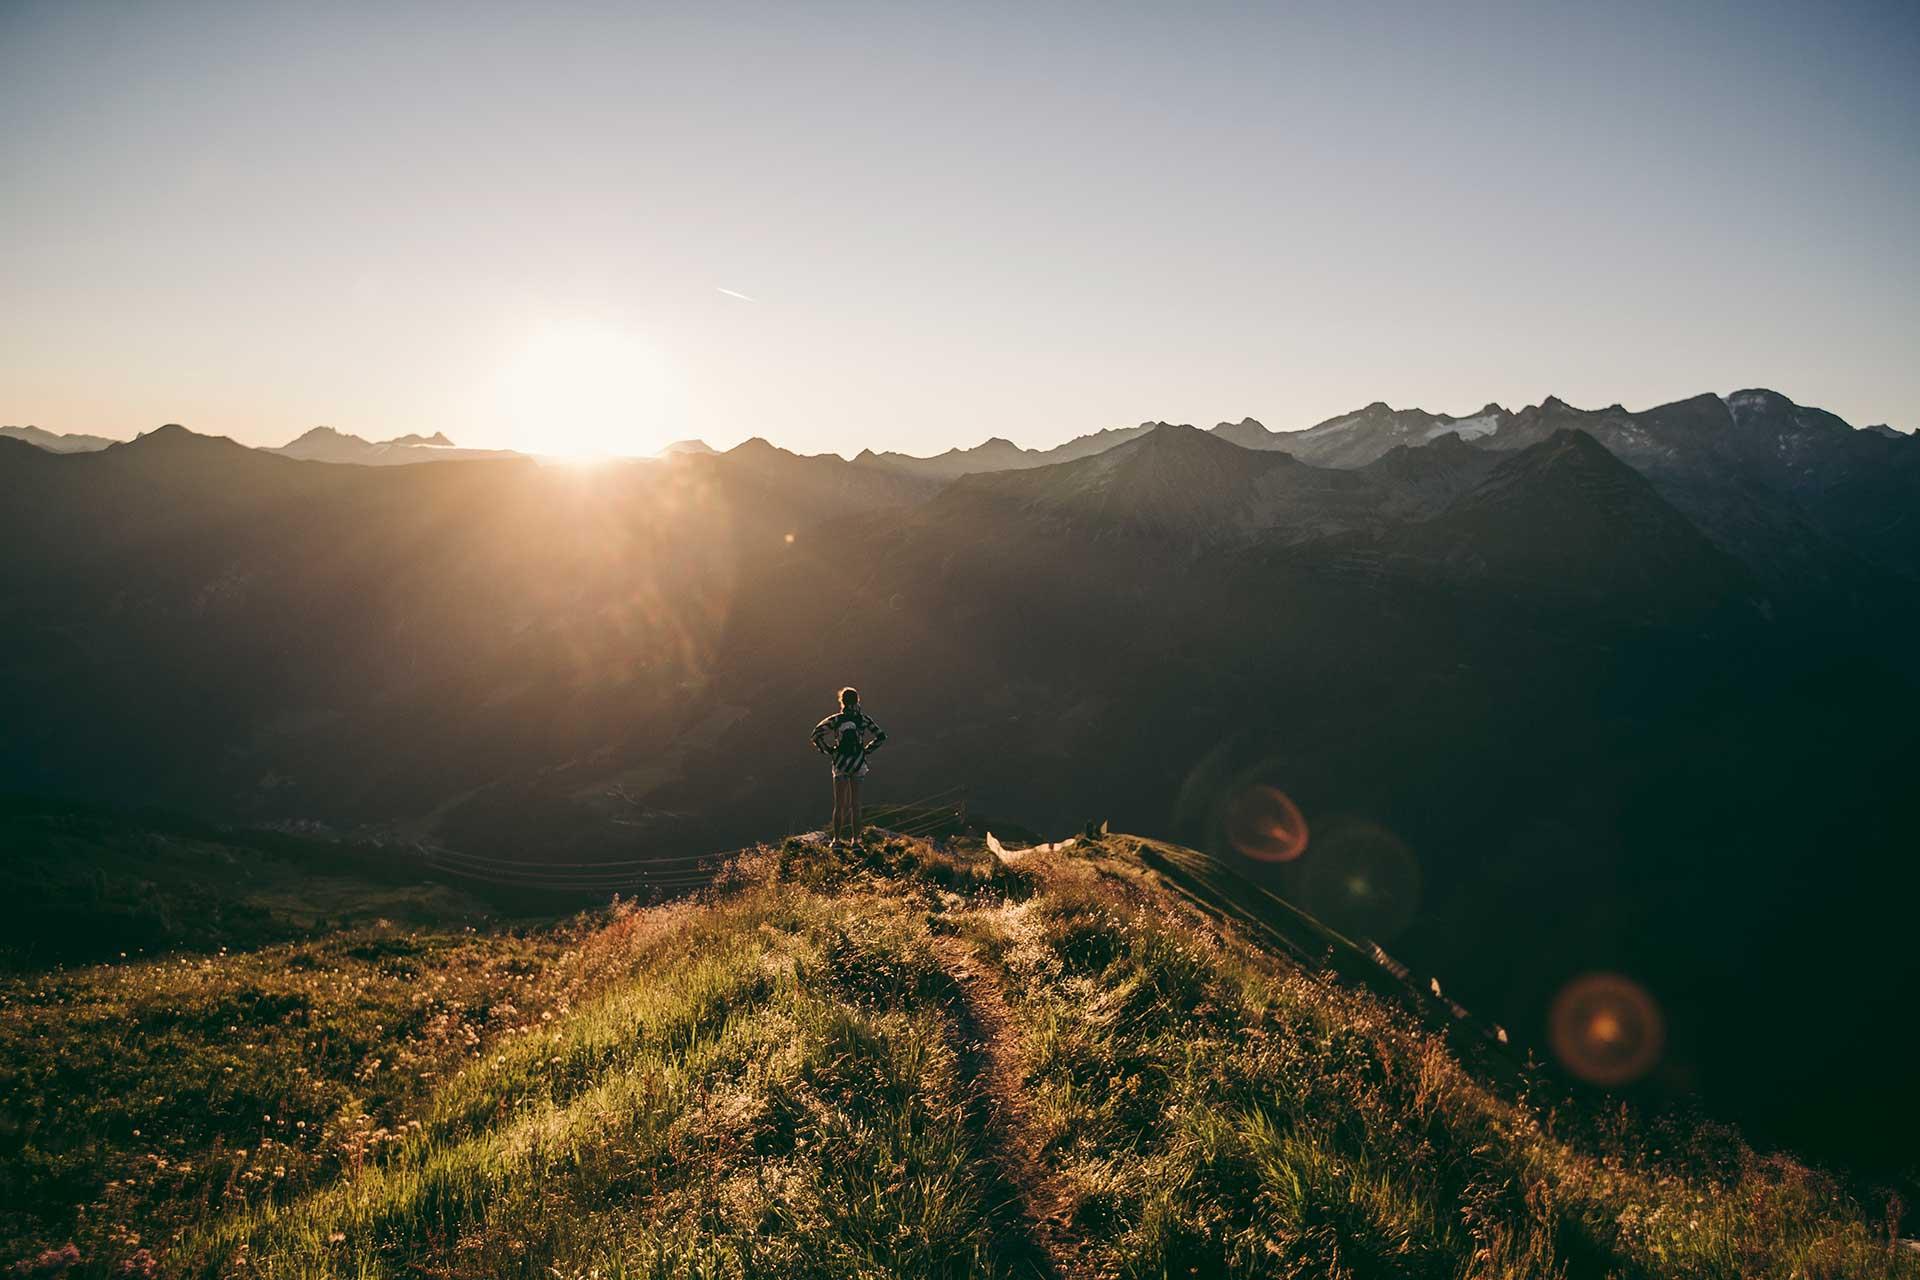 Trailrunning Fotograf Sport Outdoor Berge Sonnenuntergang Trail Fotoproduktion Berlin